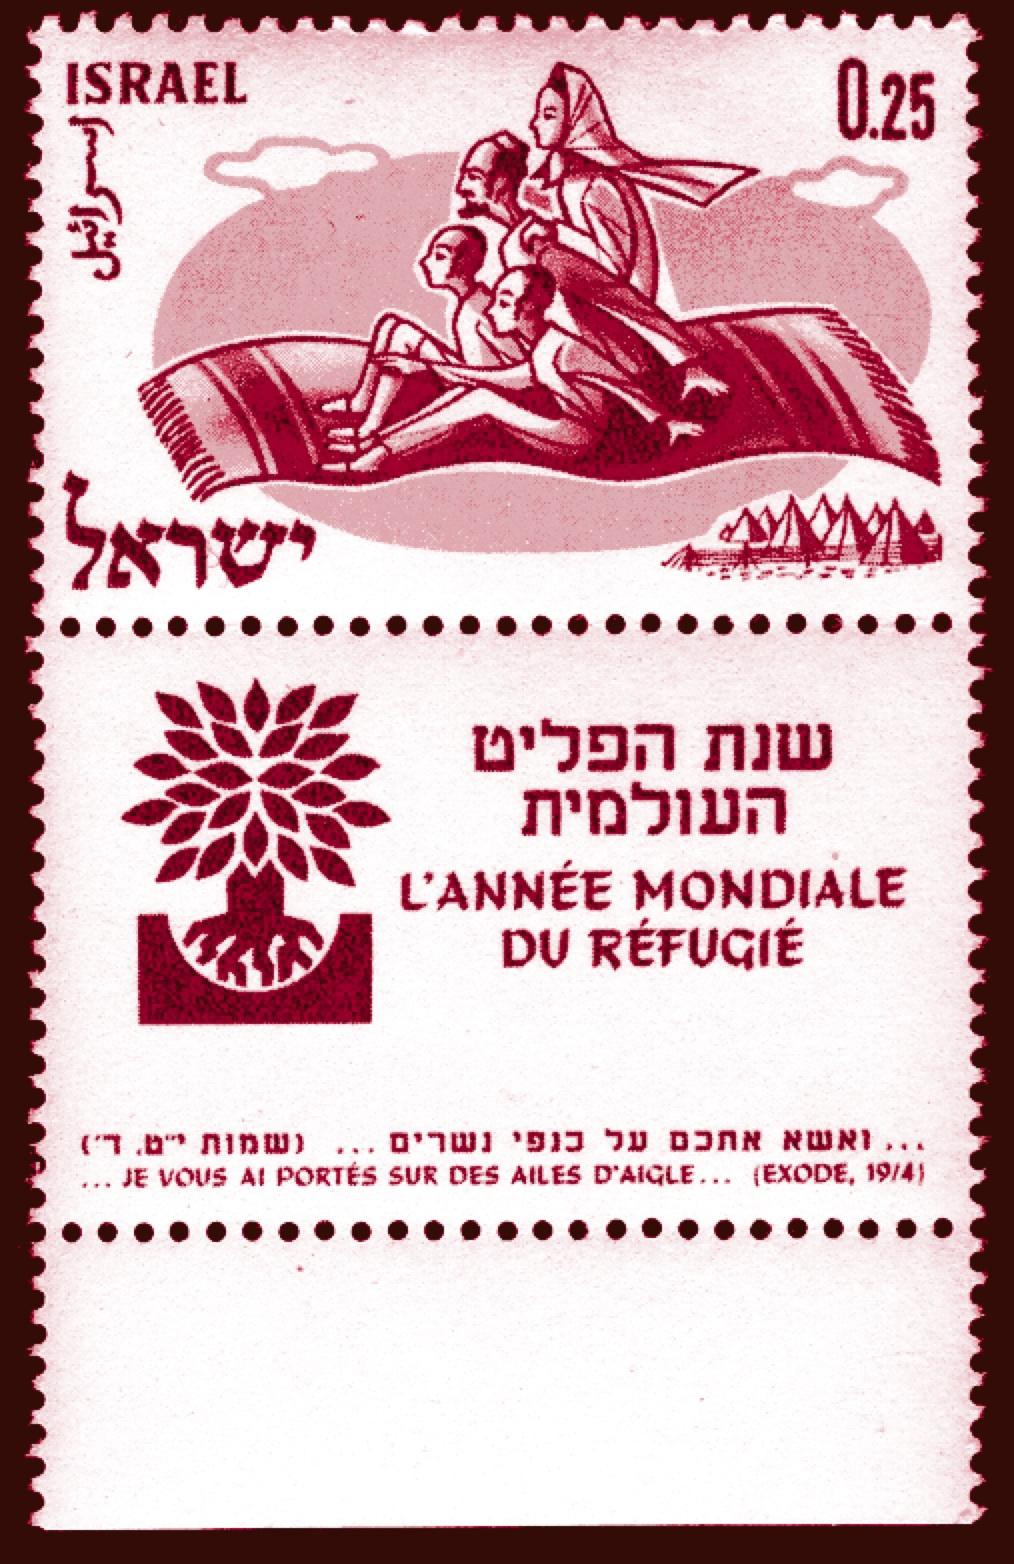 International_refugee_year_stamp_Israel_-_Exodus_19-4